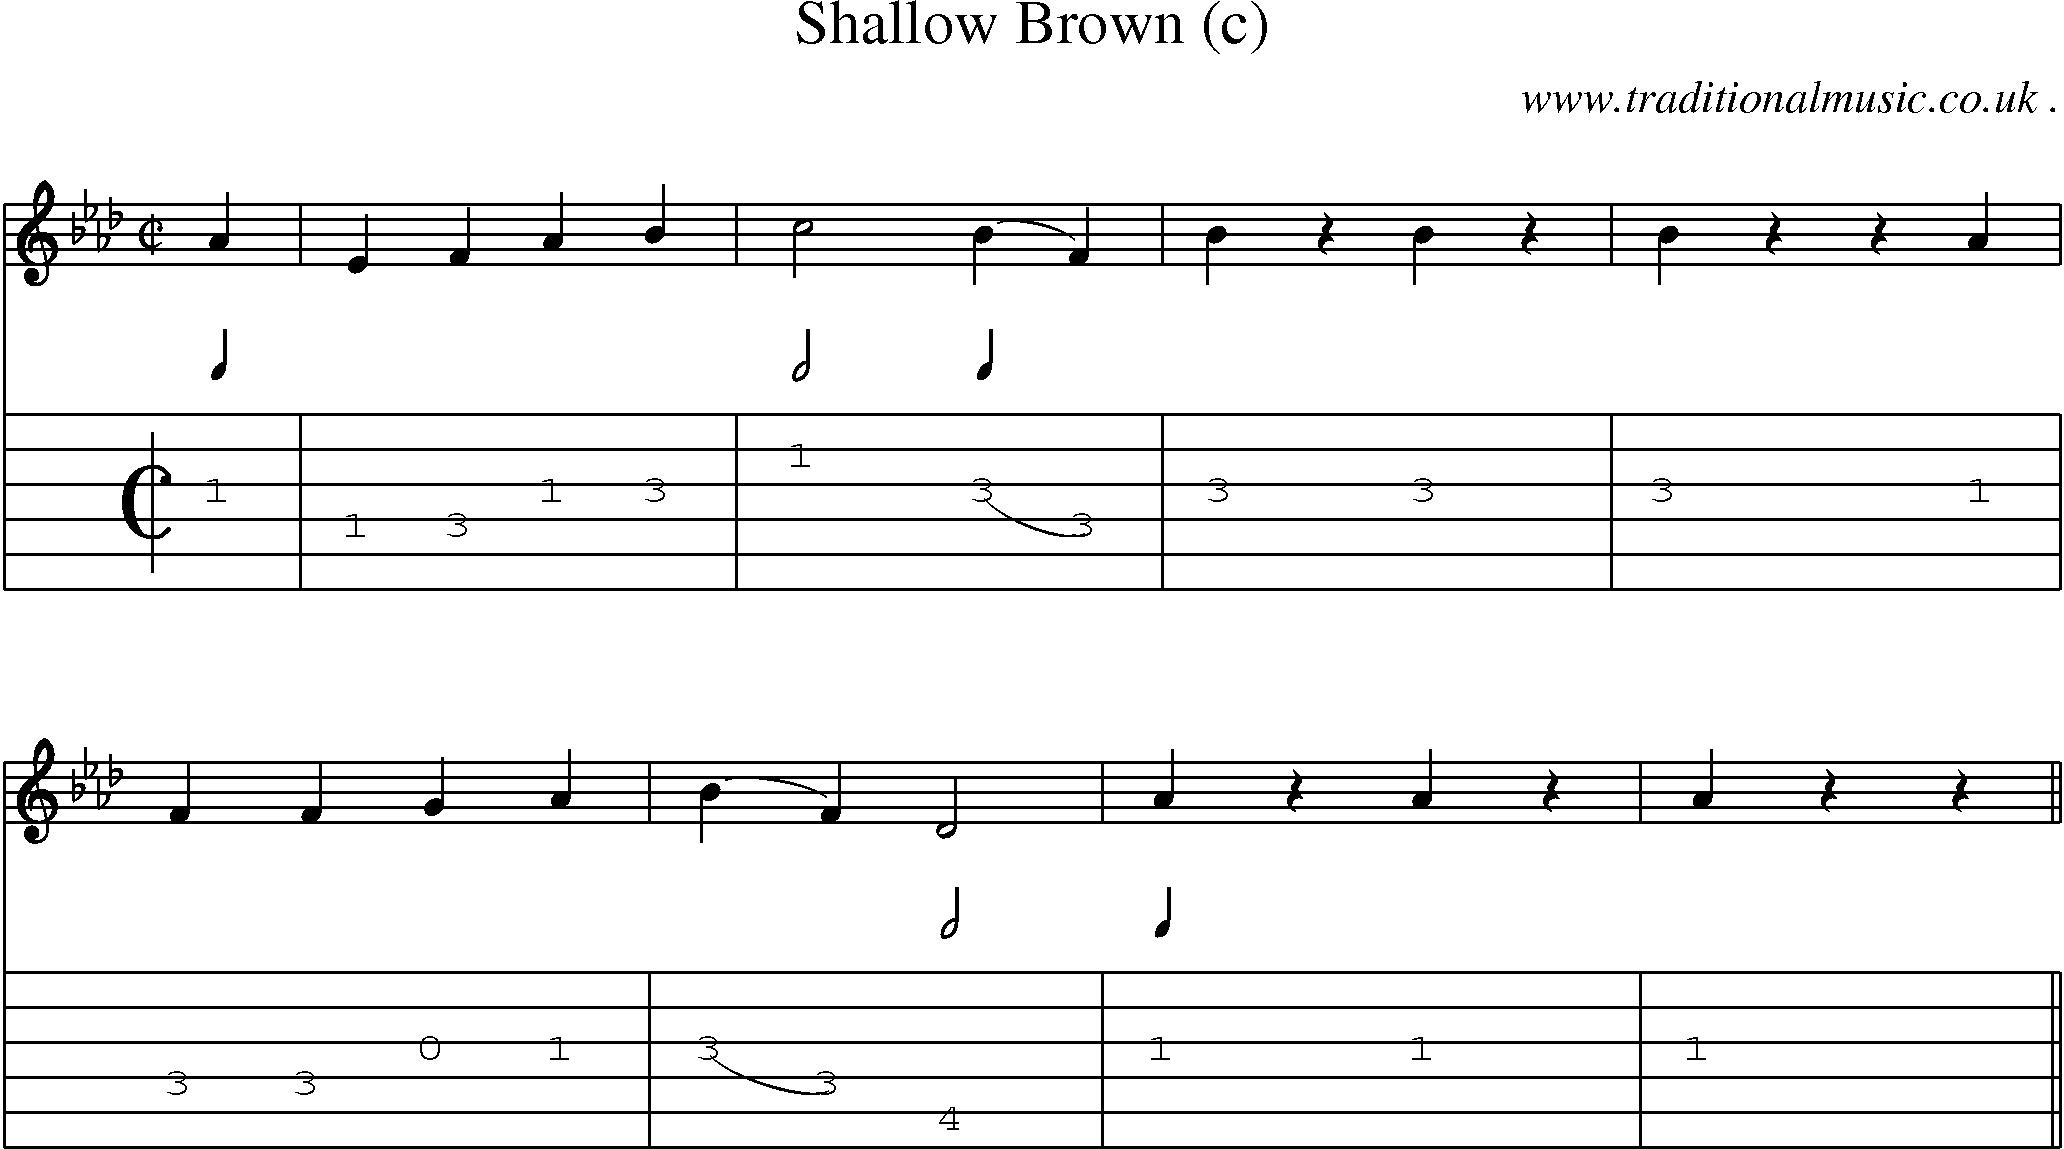 Guitar Chords Easy Shallow